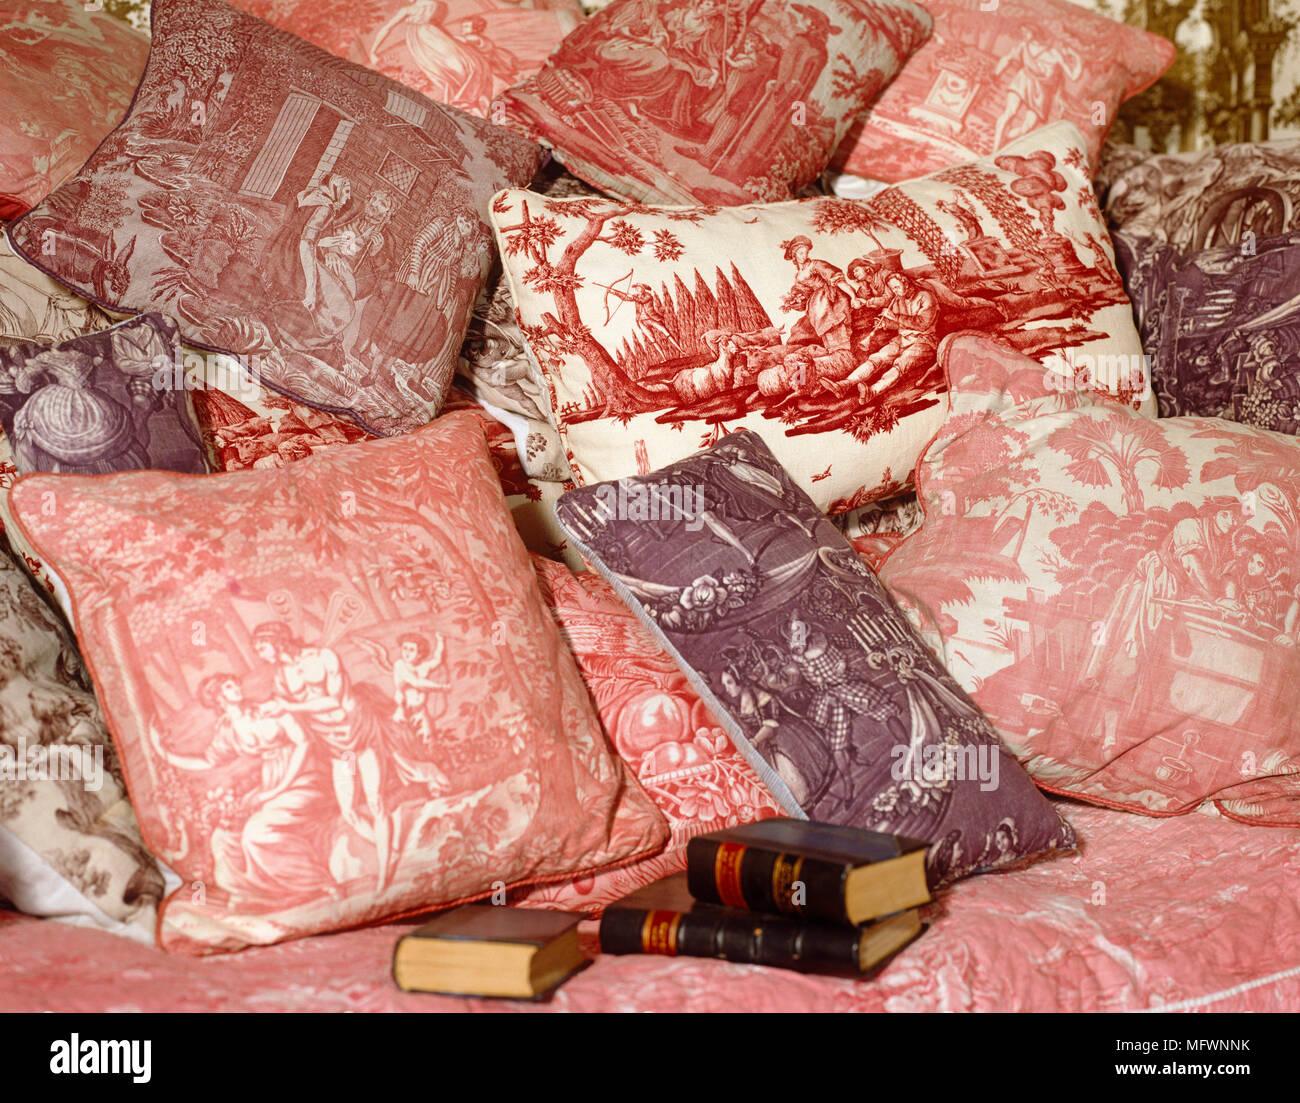 Avalon Cuscini.Collection Toile De Jouy Fabric Cushions Stock Photo 181889391